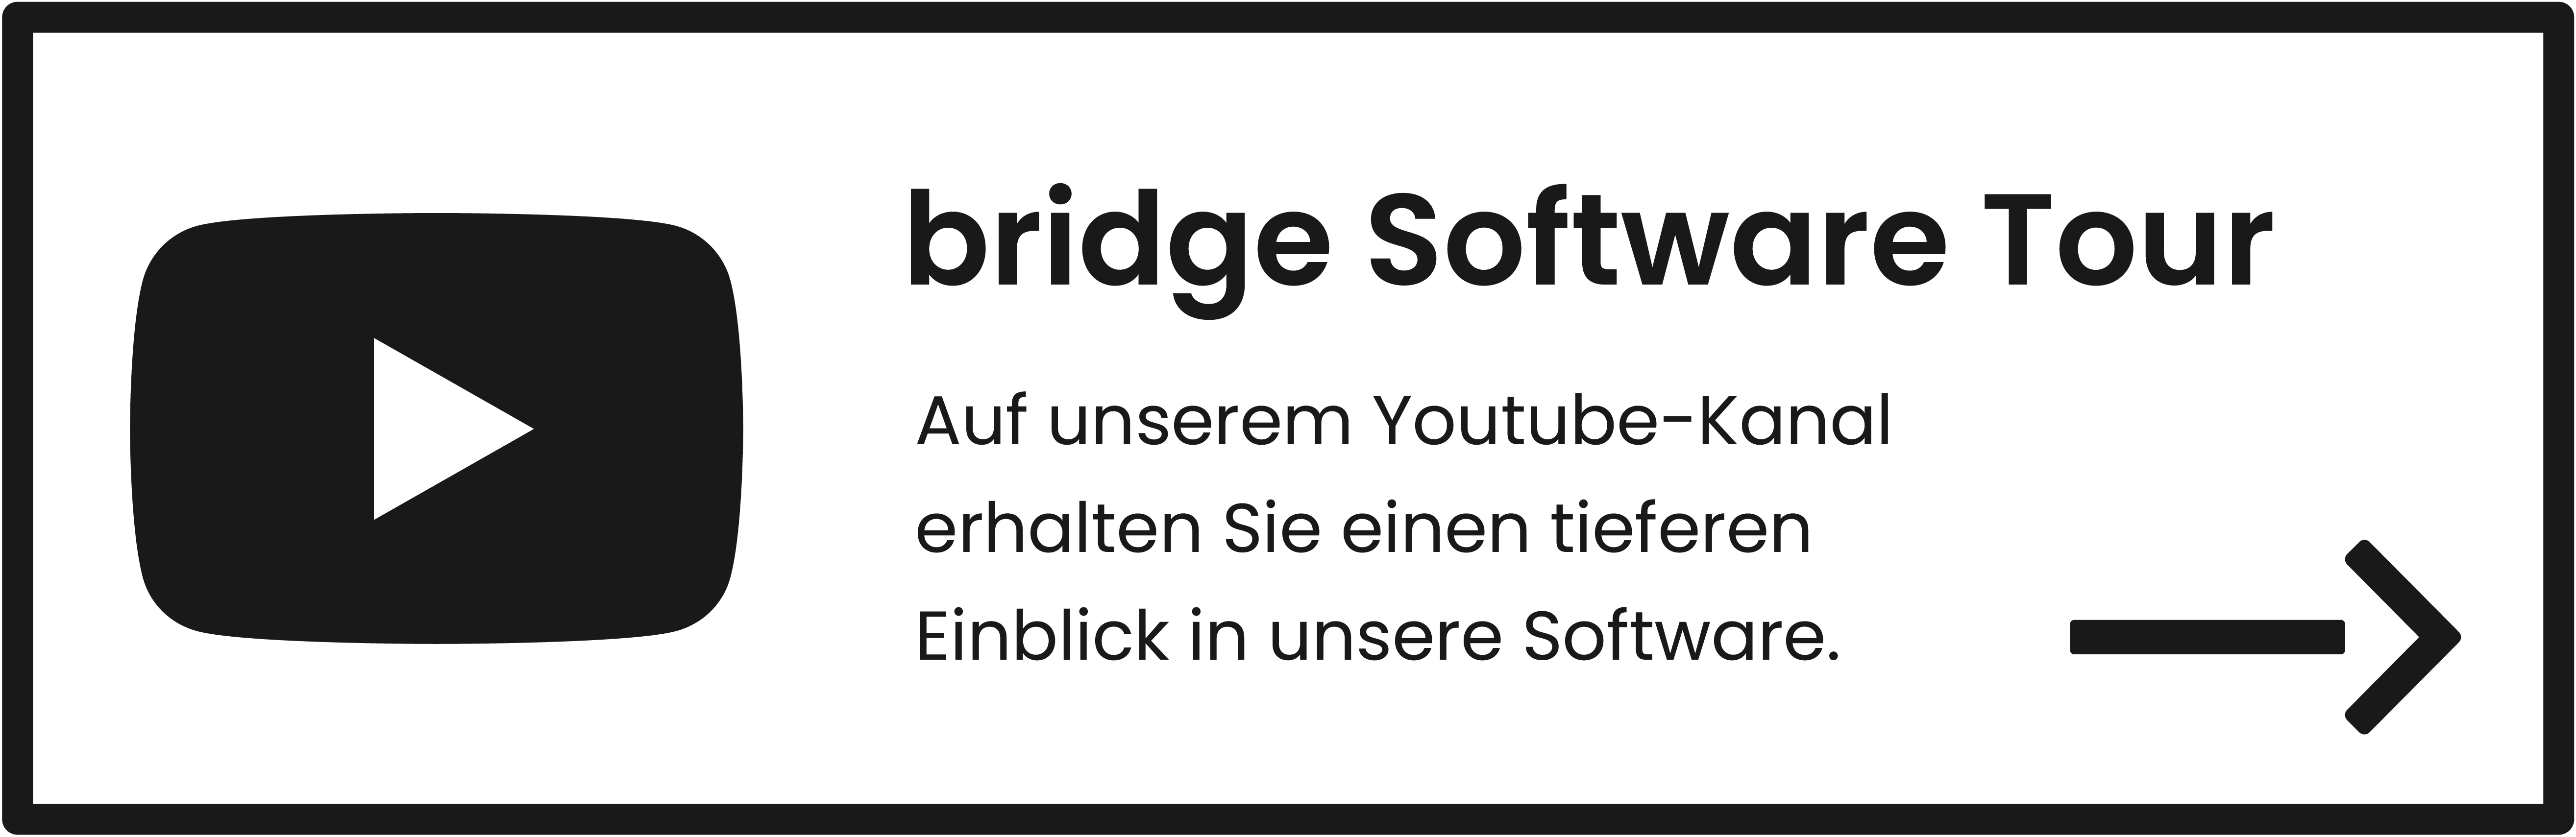 teaser-bridge-videoberatung-software-tour-youtube